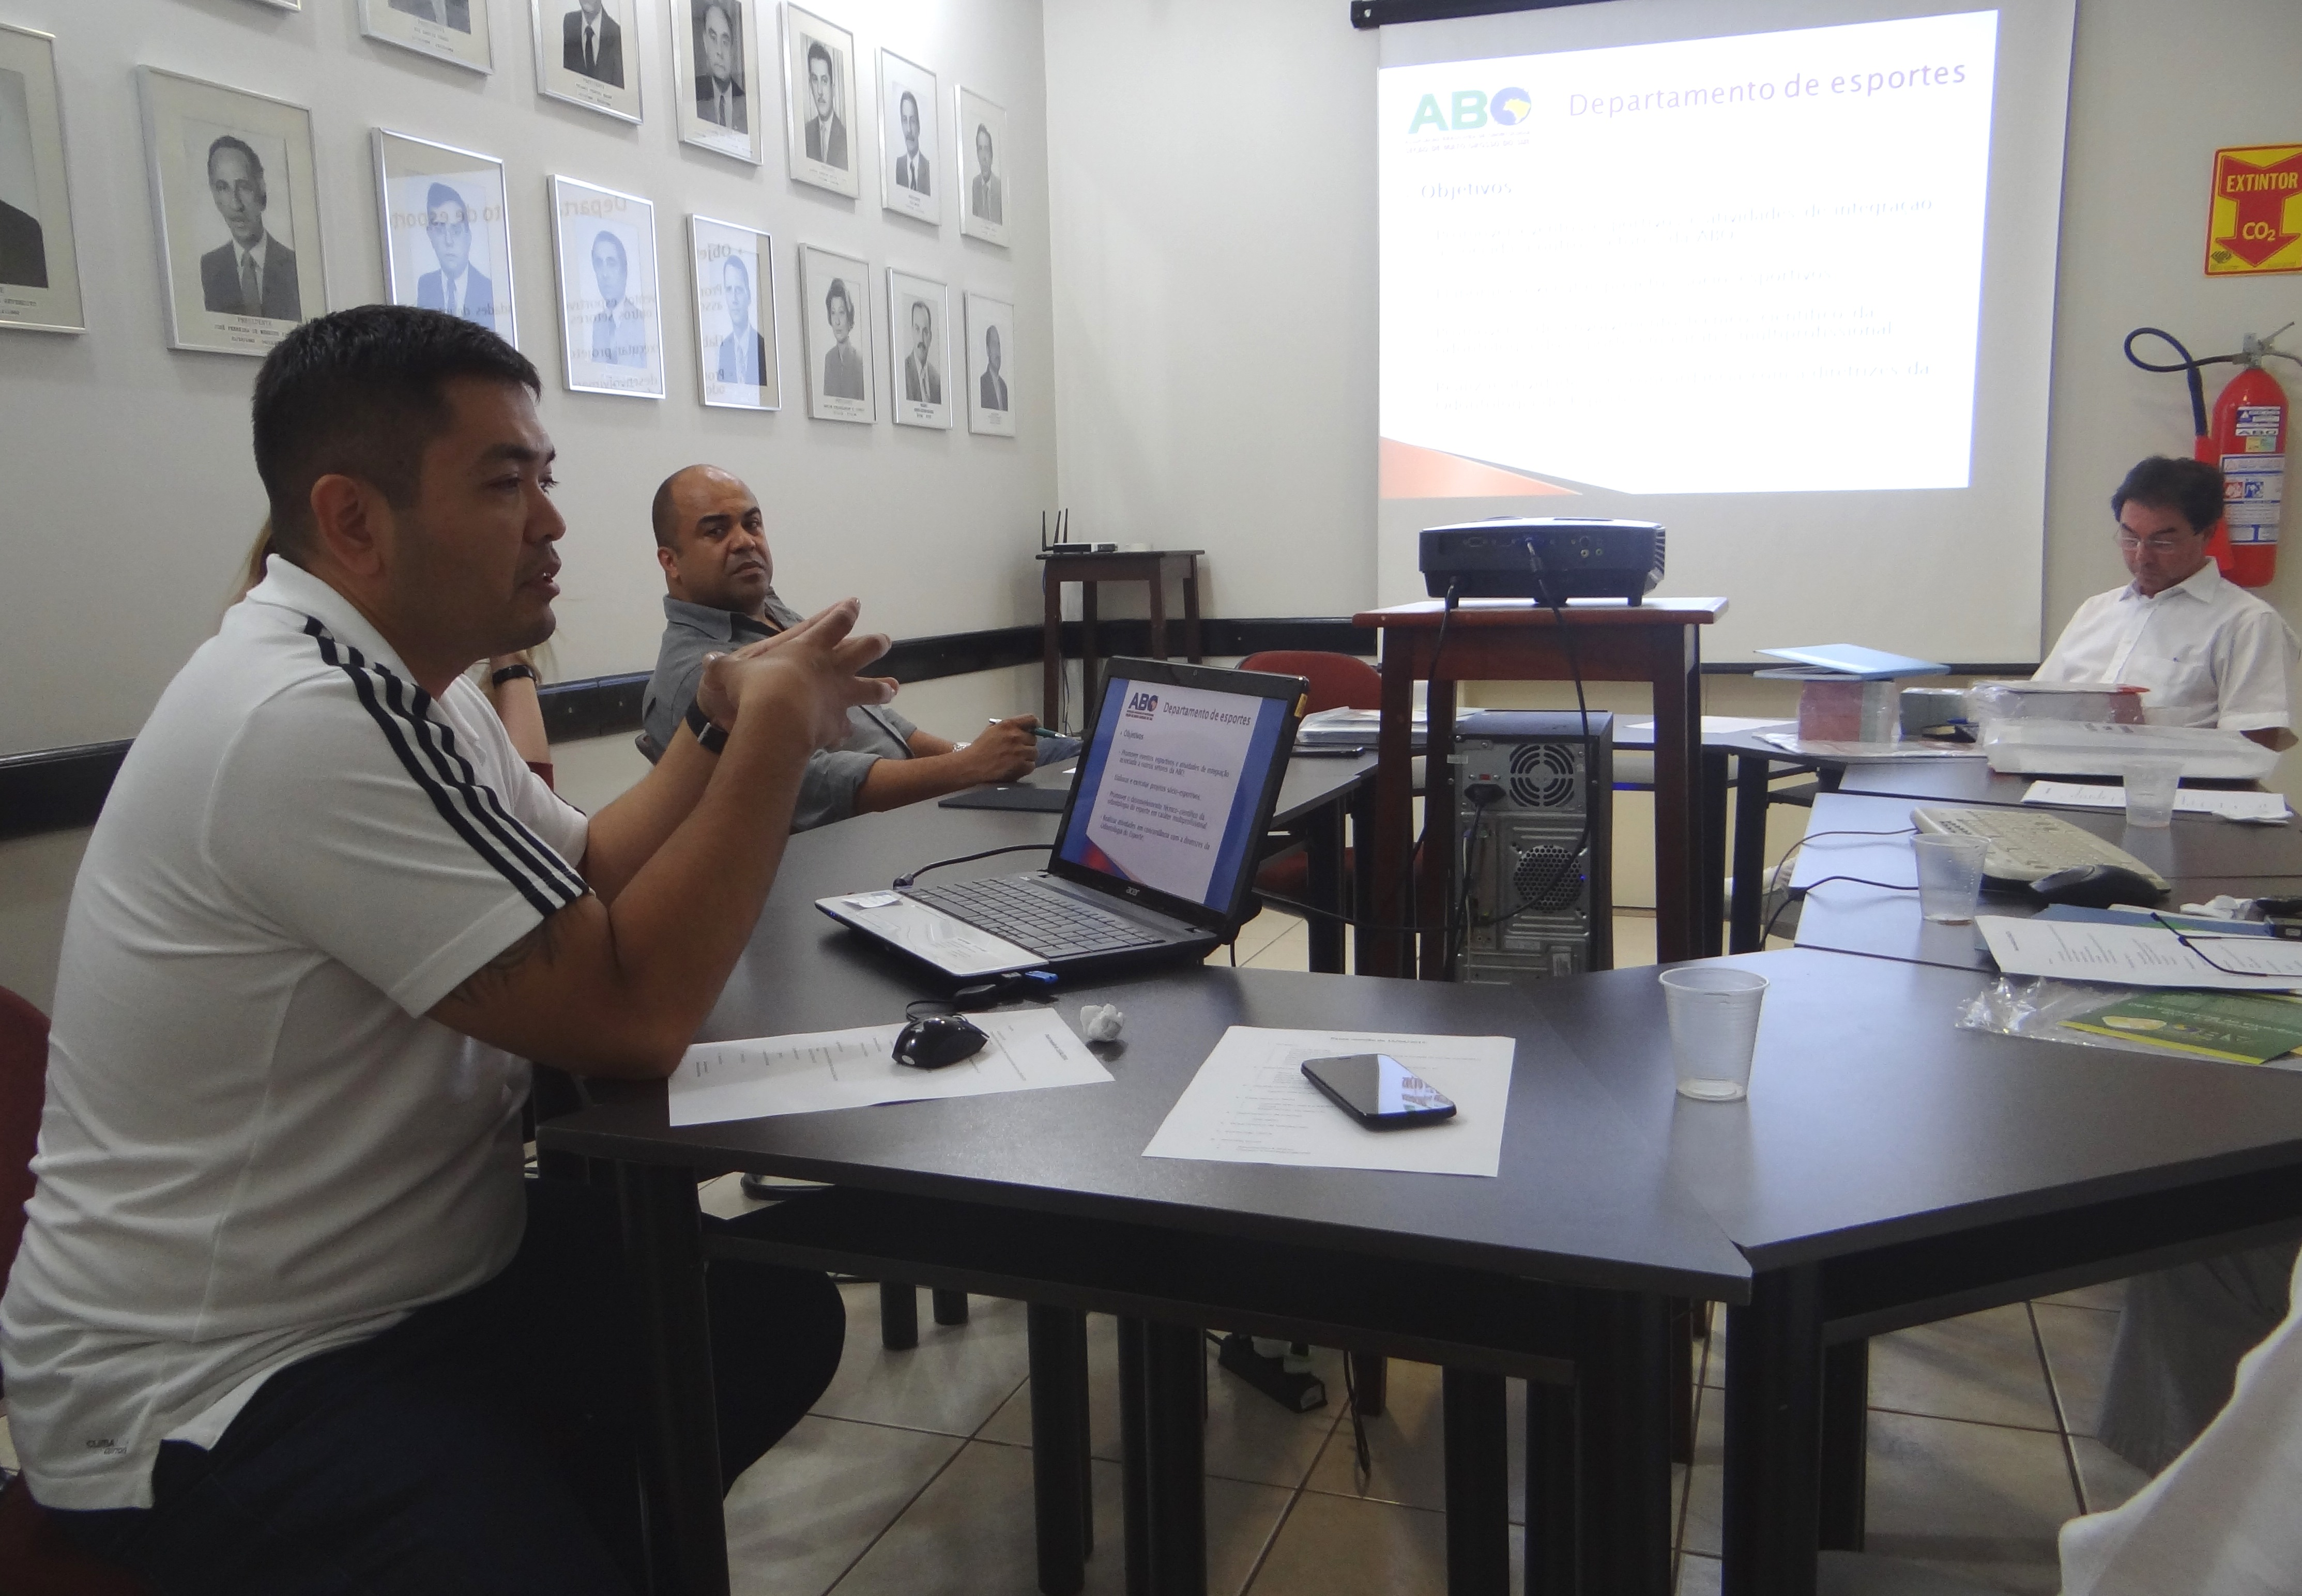 Departamento de Esportes da ABO-MS planeja atividades para 2014